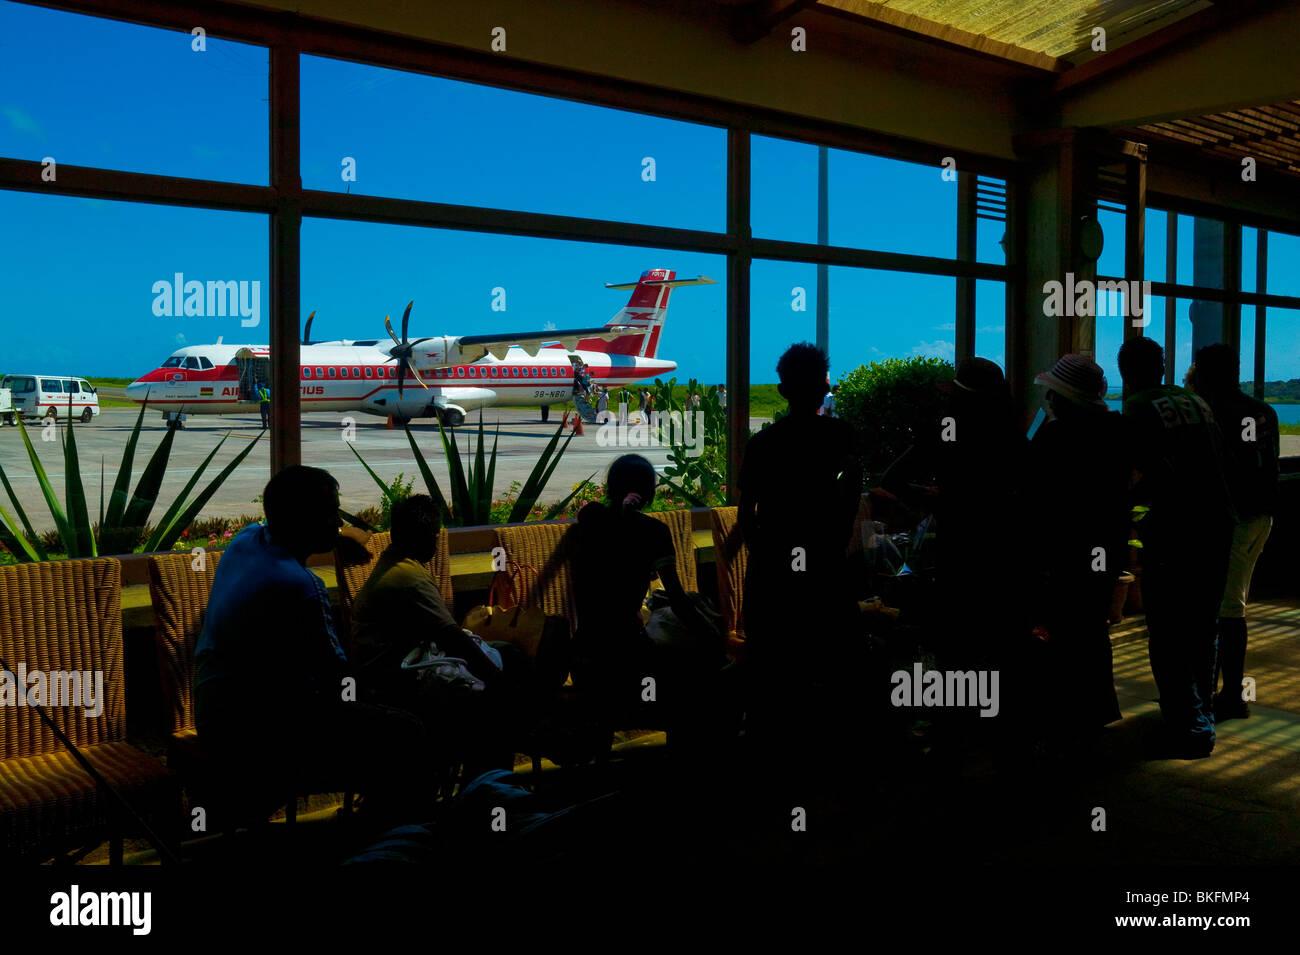 AIRPORT OF RODRIGUES ISLAND, MAURITIUS REPUBLIC - Stock Image